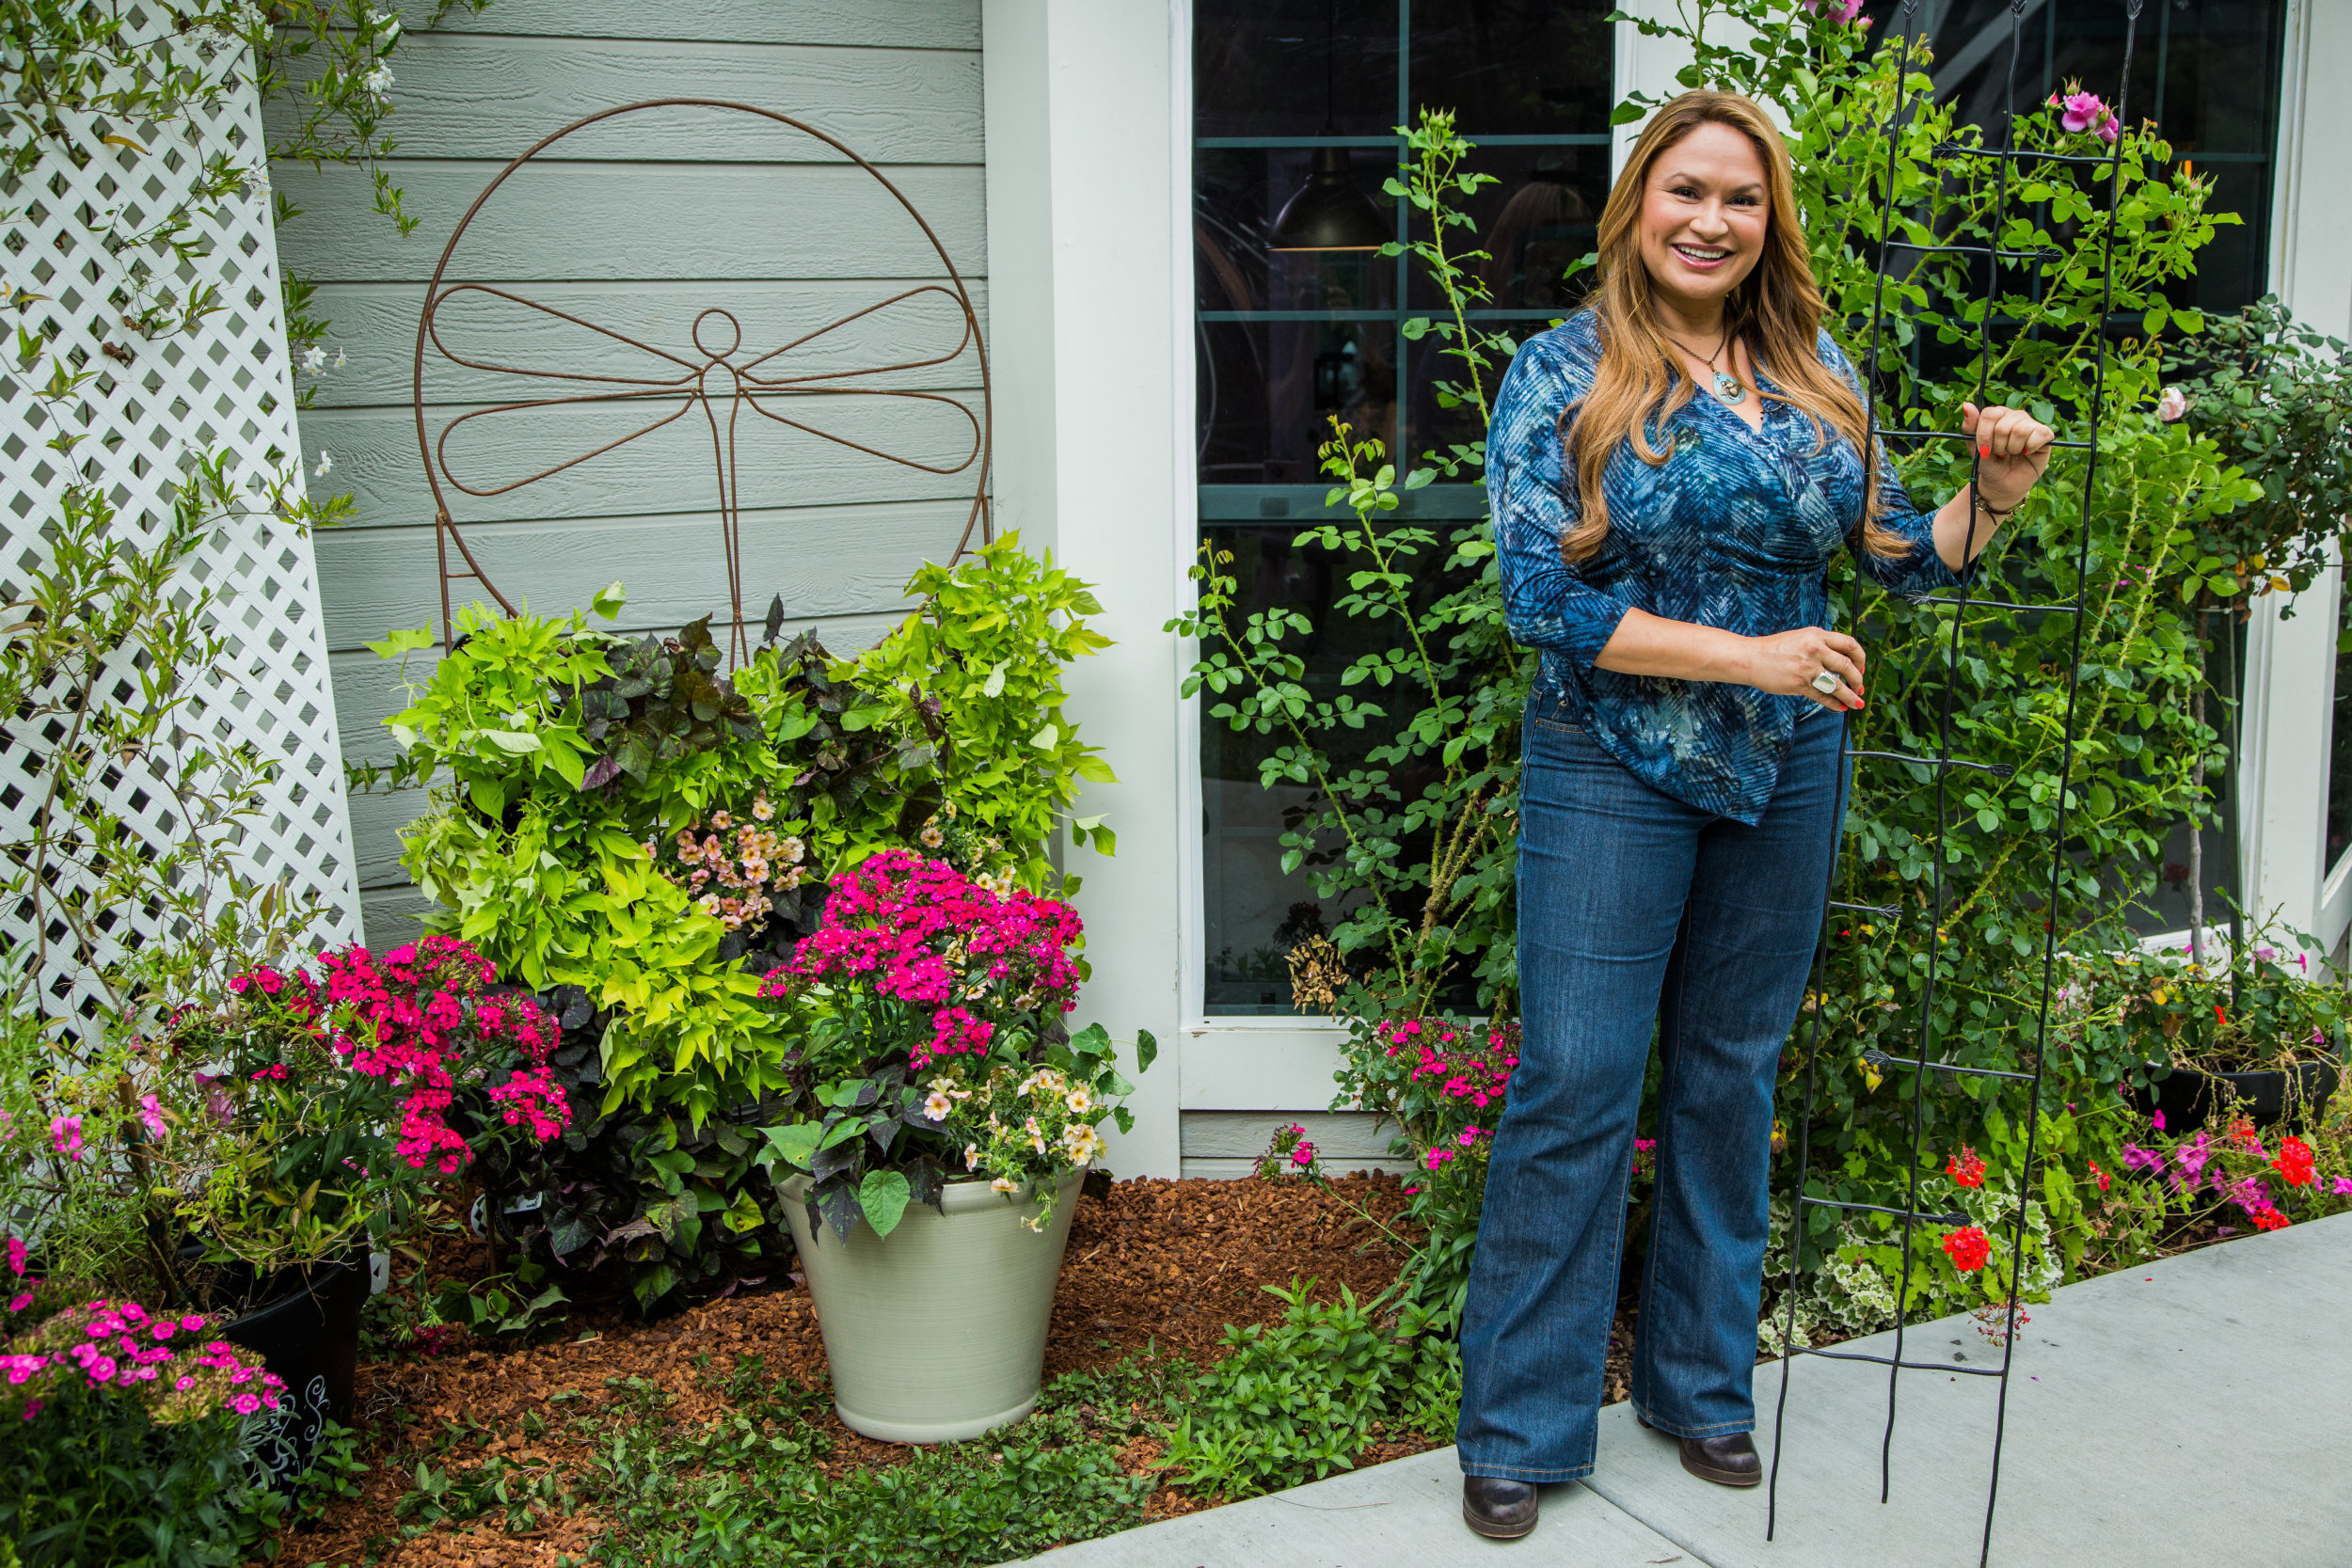 Do it yourself wall garden video hallmark channel Home channel gardening